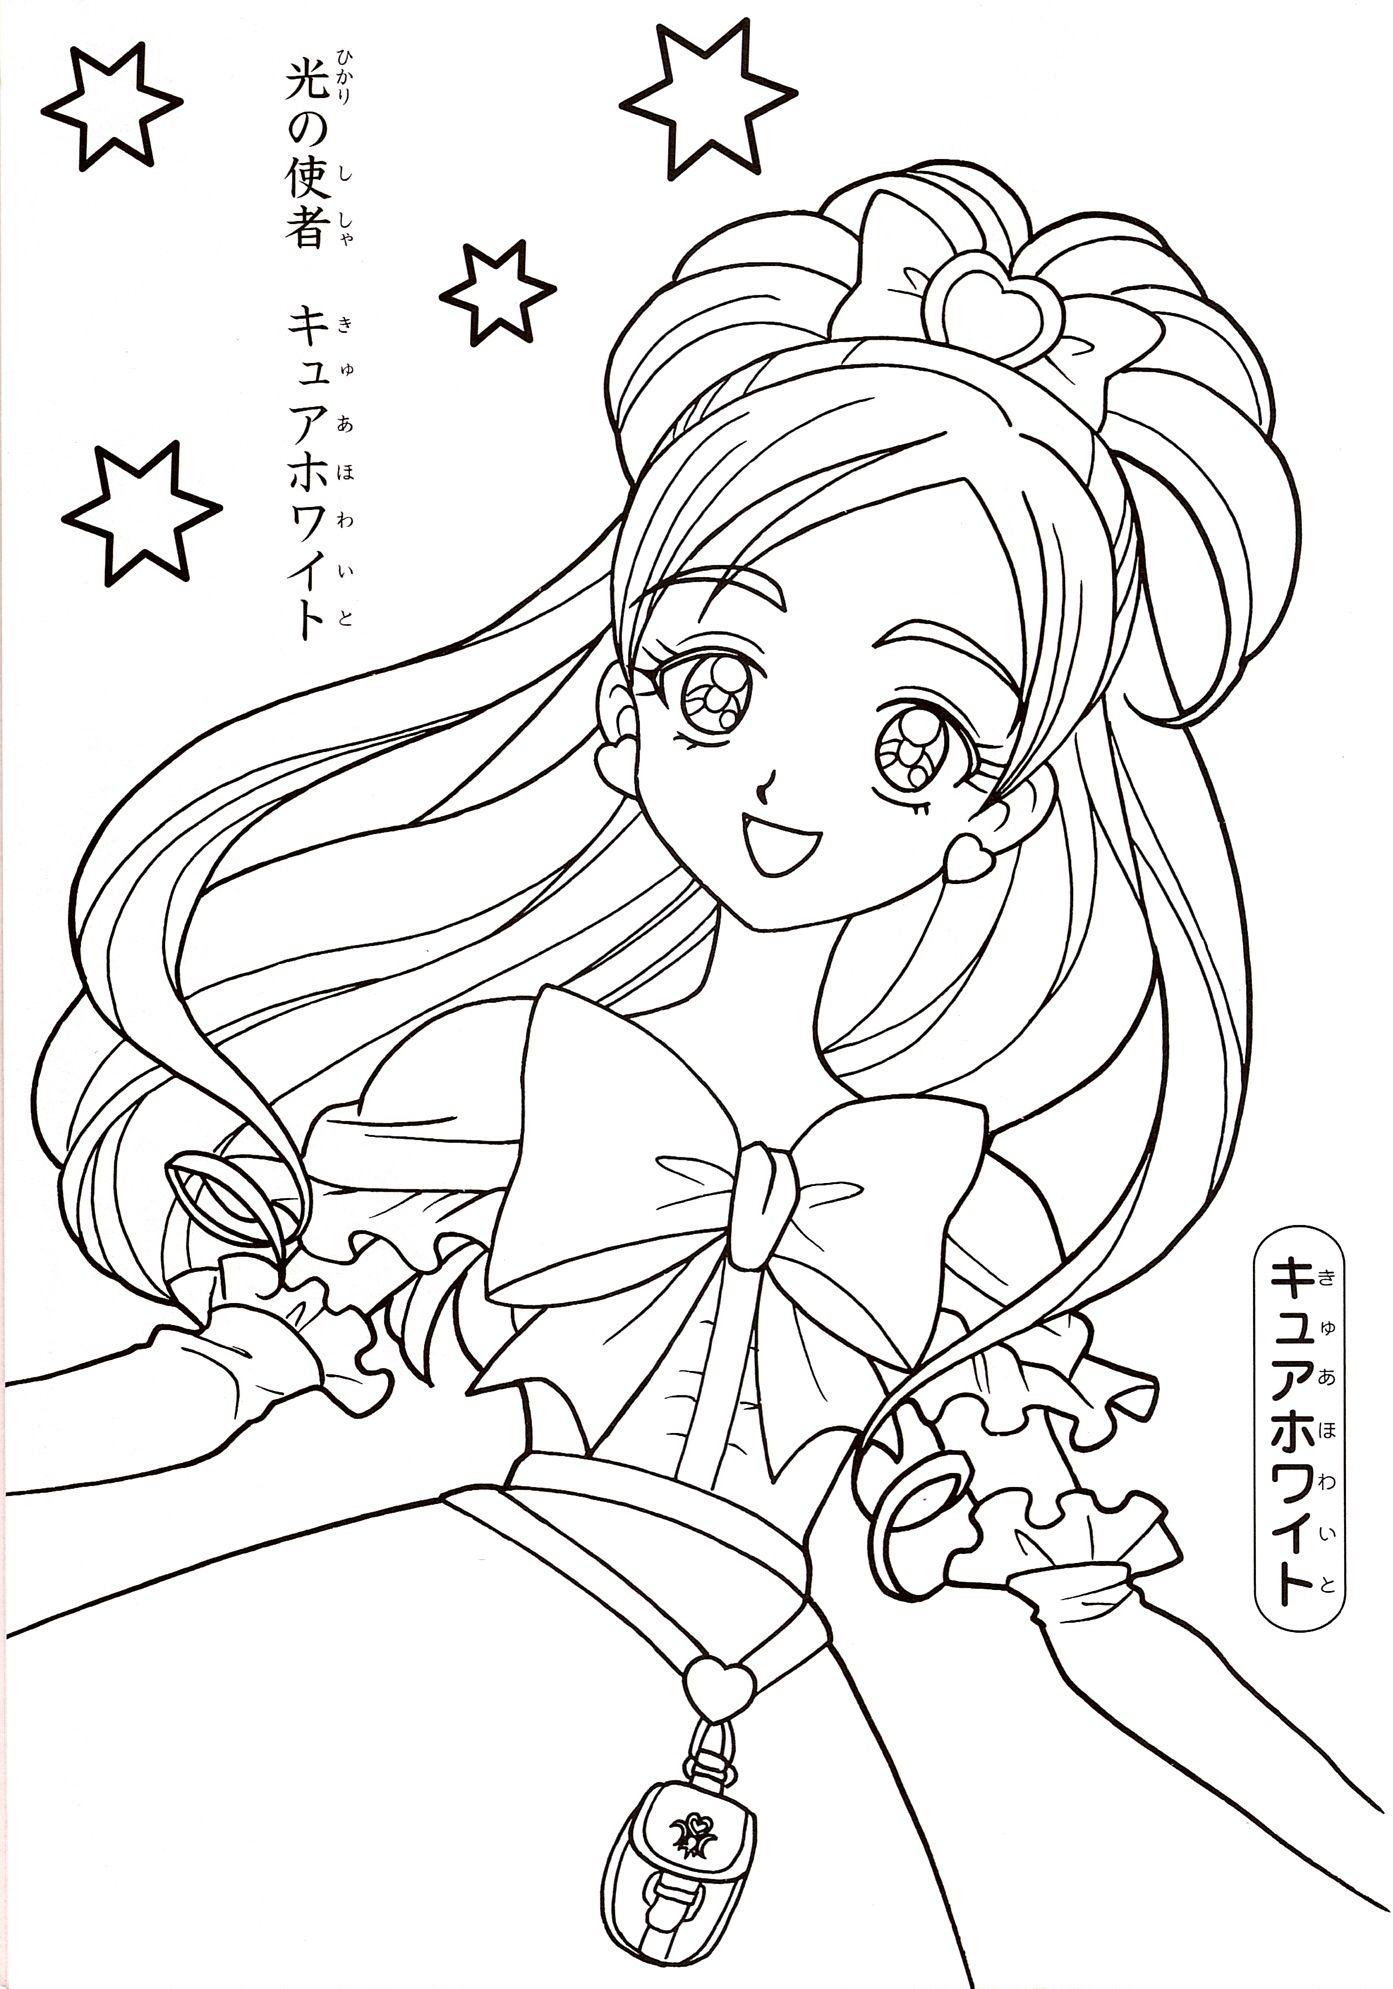 Futari wa precure disney coloring pages cute coloring